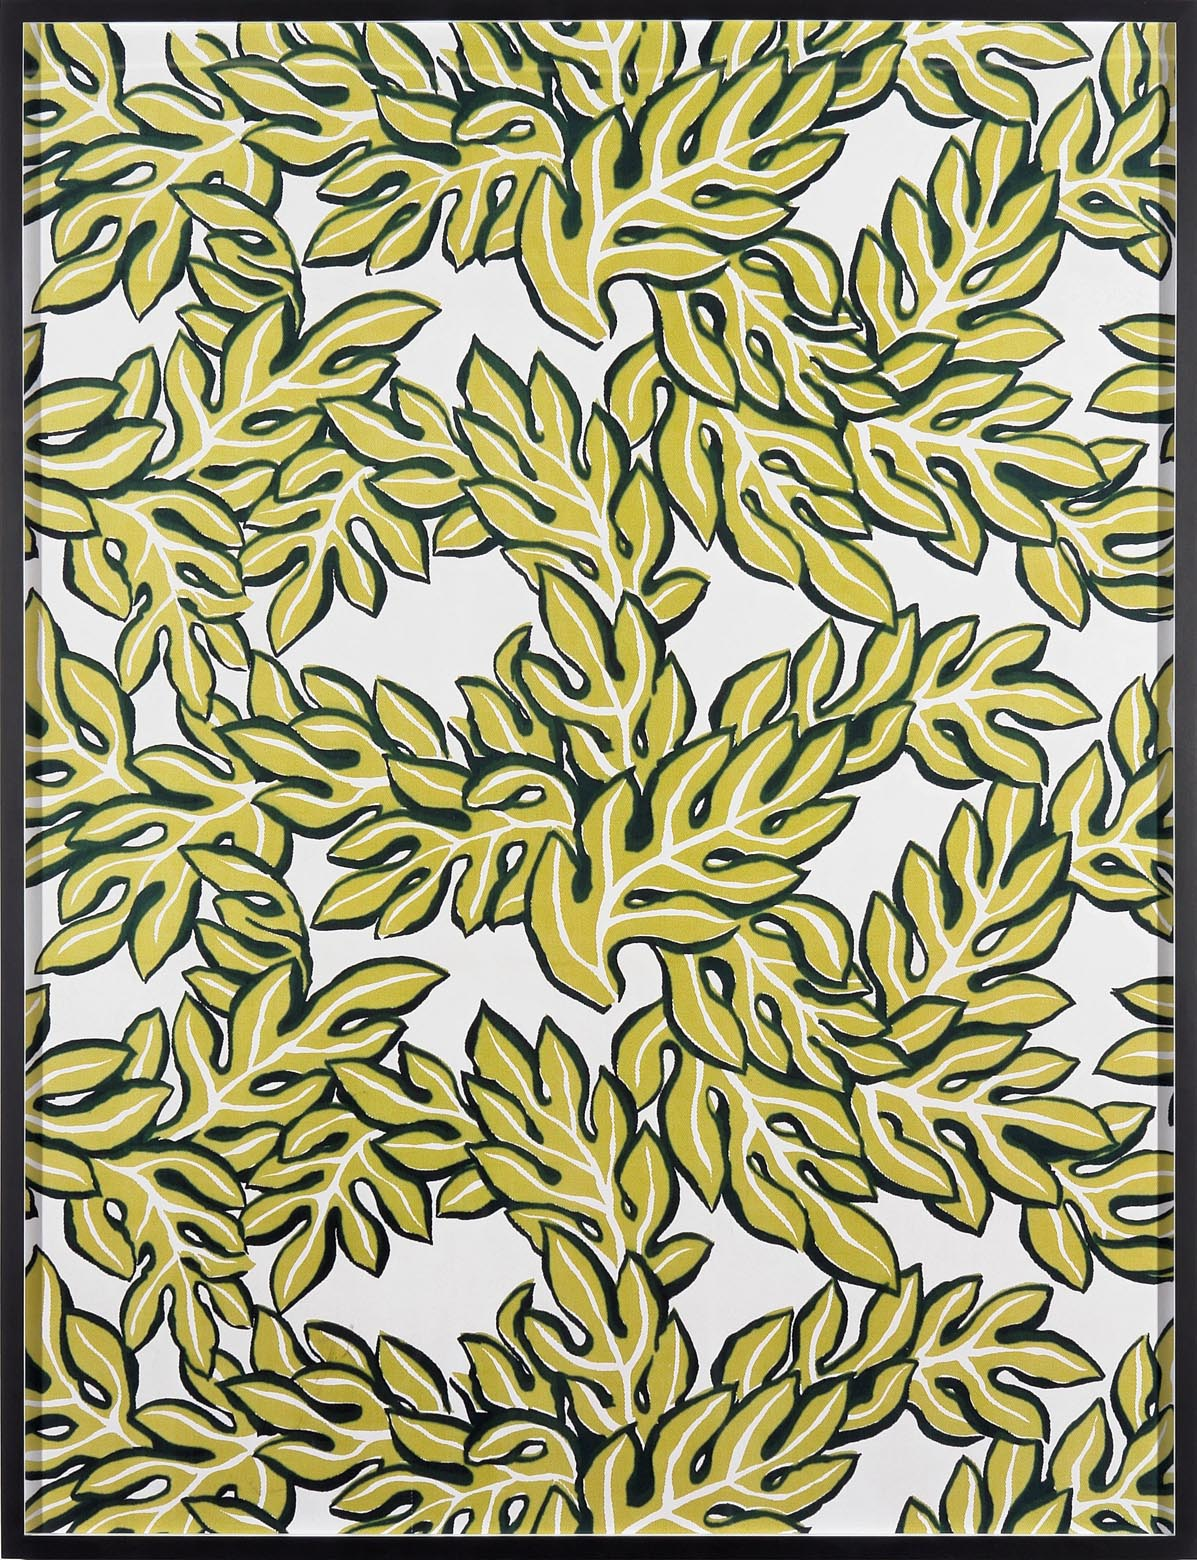 Annette Kelm Big Print #6 (Jungle Leaves - cotton twill 1947 design Dorothy Draper, courtesy Schumacher &Co) 2007 C-Print:131.5 x 100.5 cm